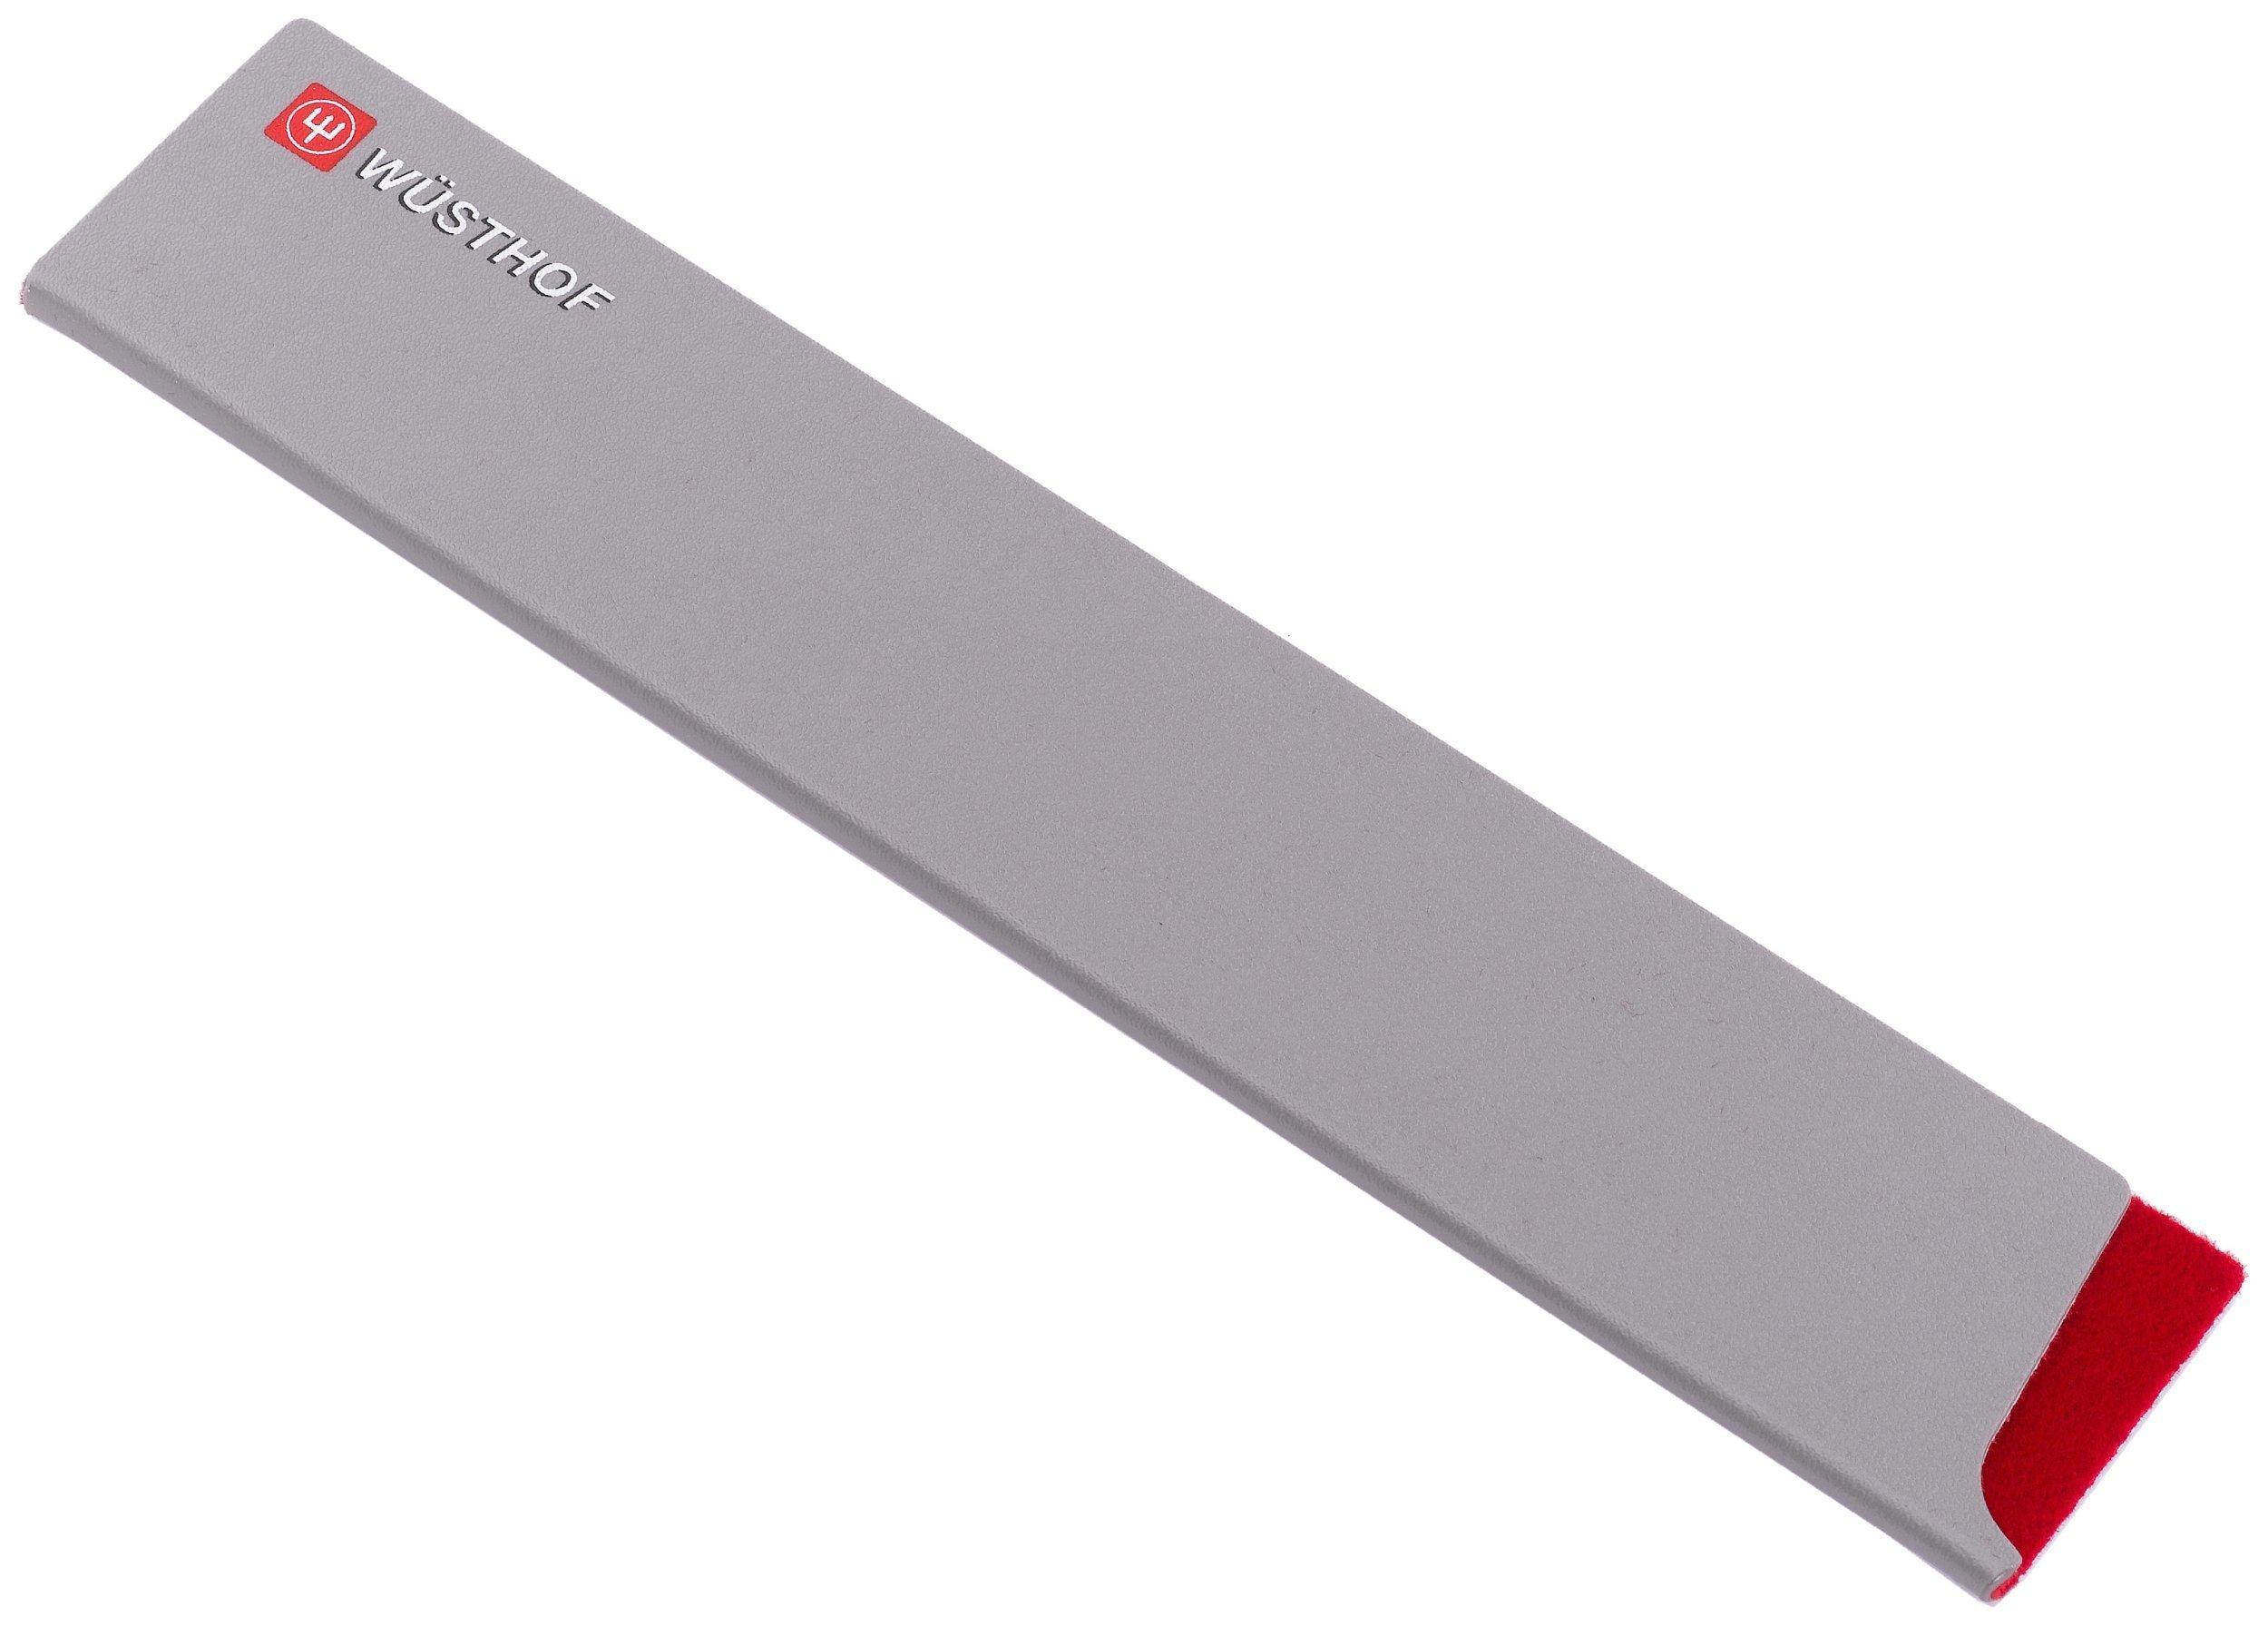 galleon wusthof blade guard 10 inch chef 39 s knife. Black Bedroom Furniture Sets. Home Design Ideas